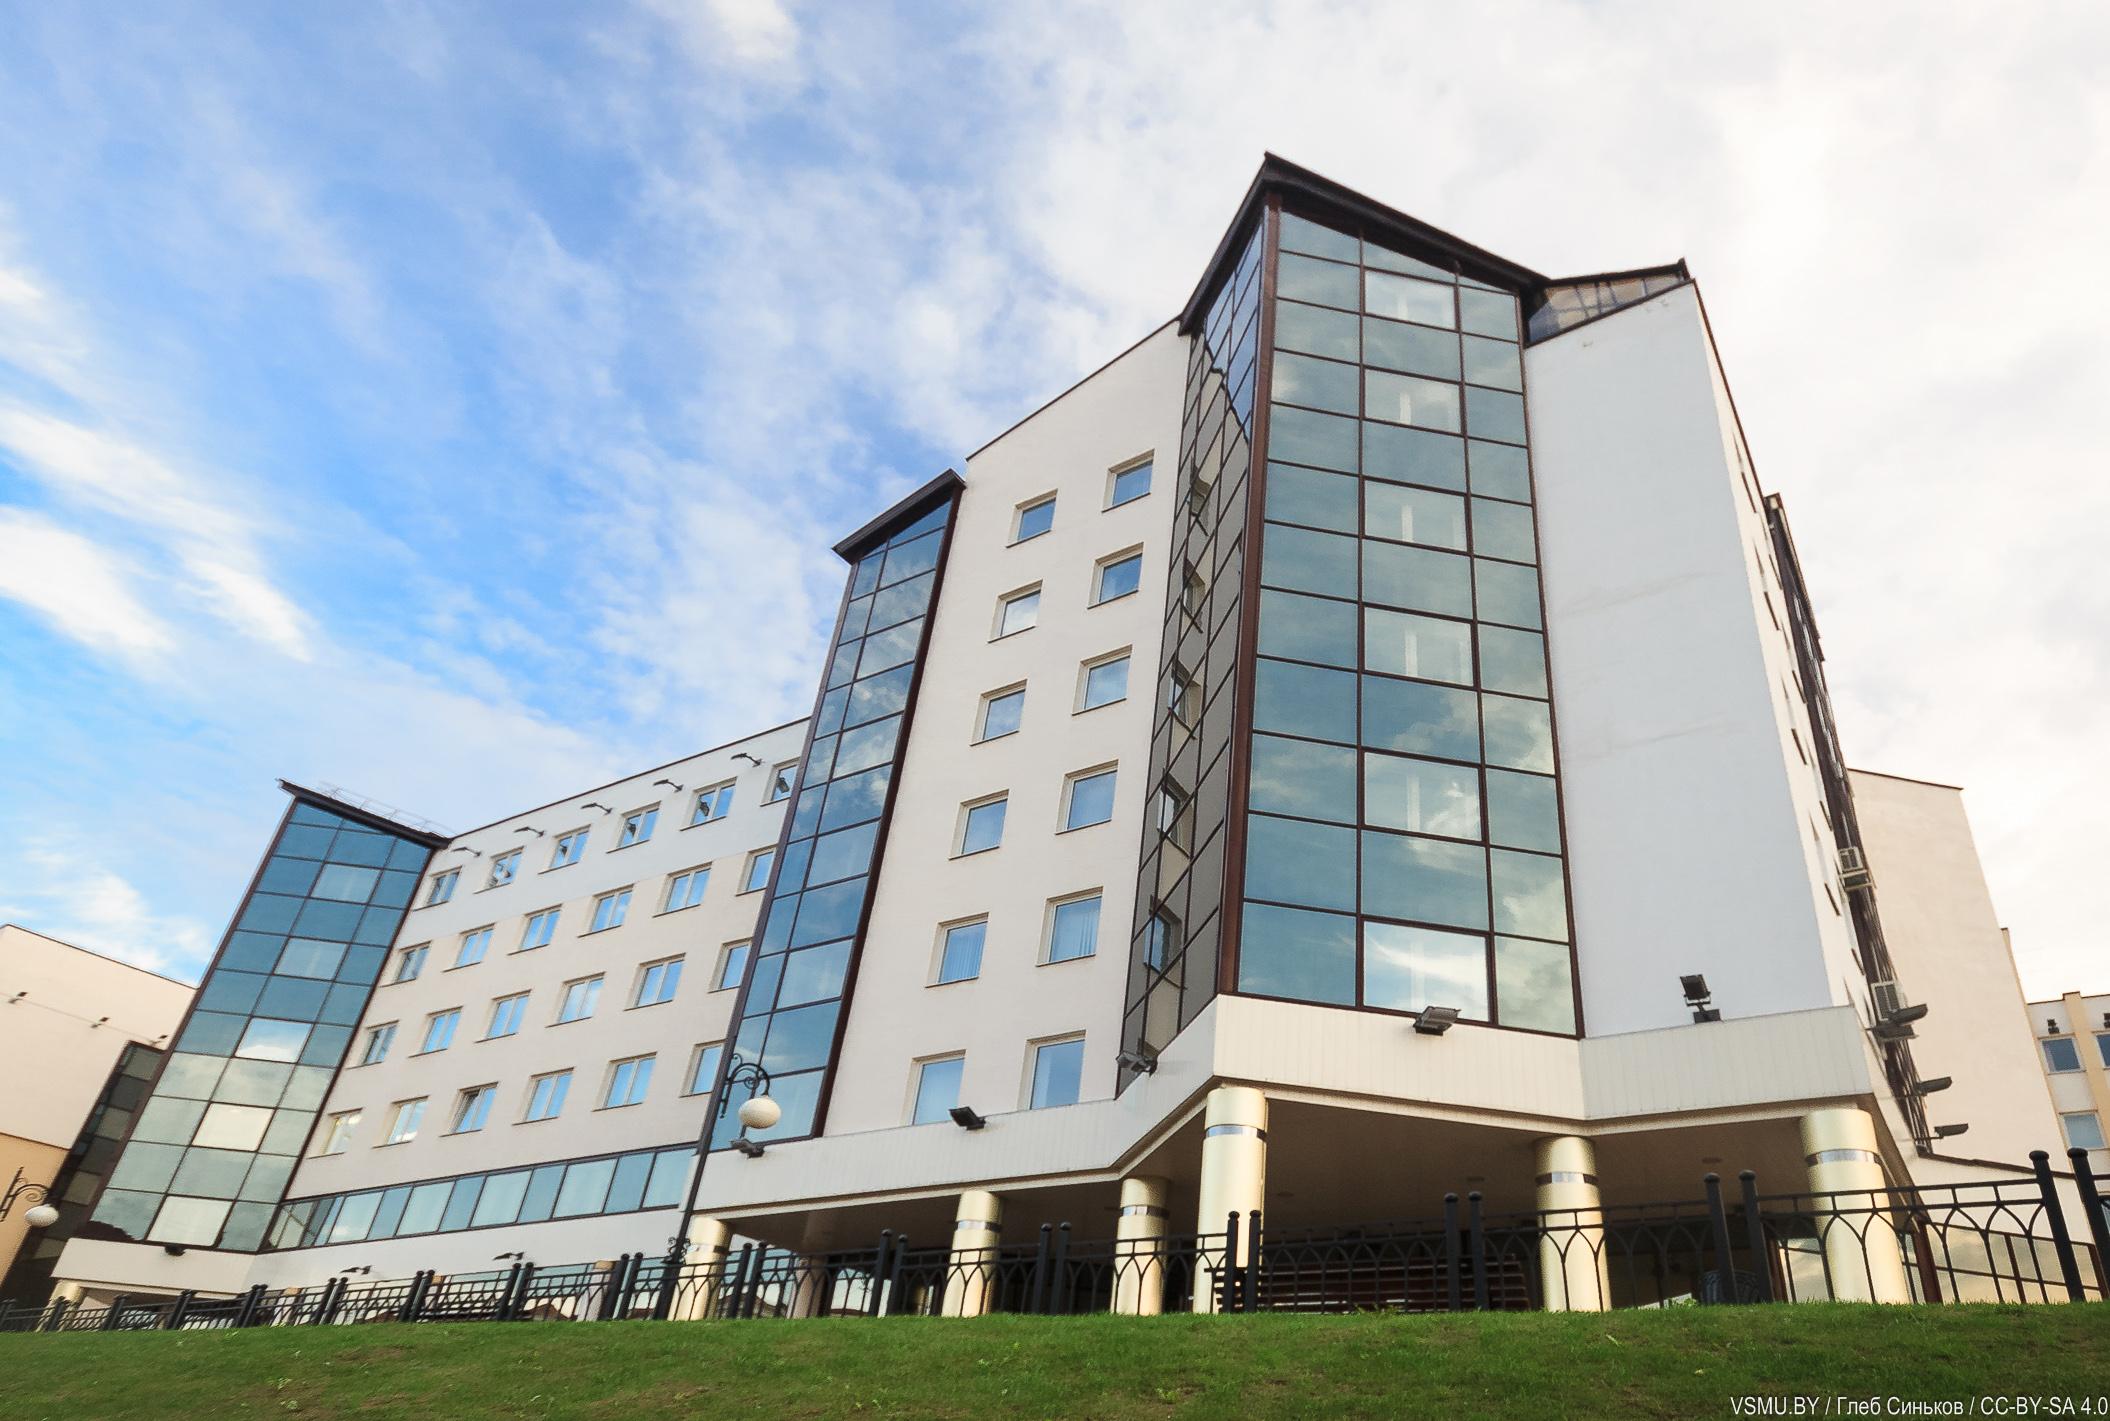 Tuition Fees in Vitebsk State Medical University (VSMU)